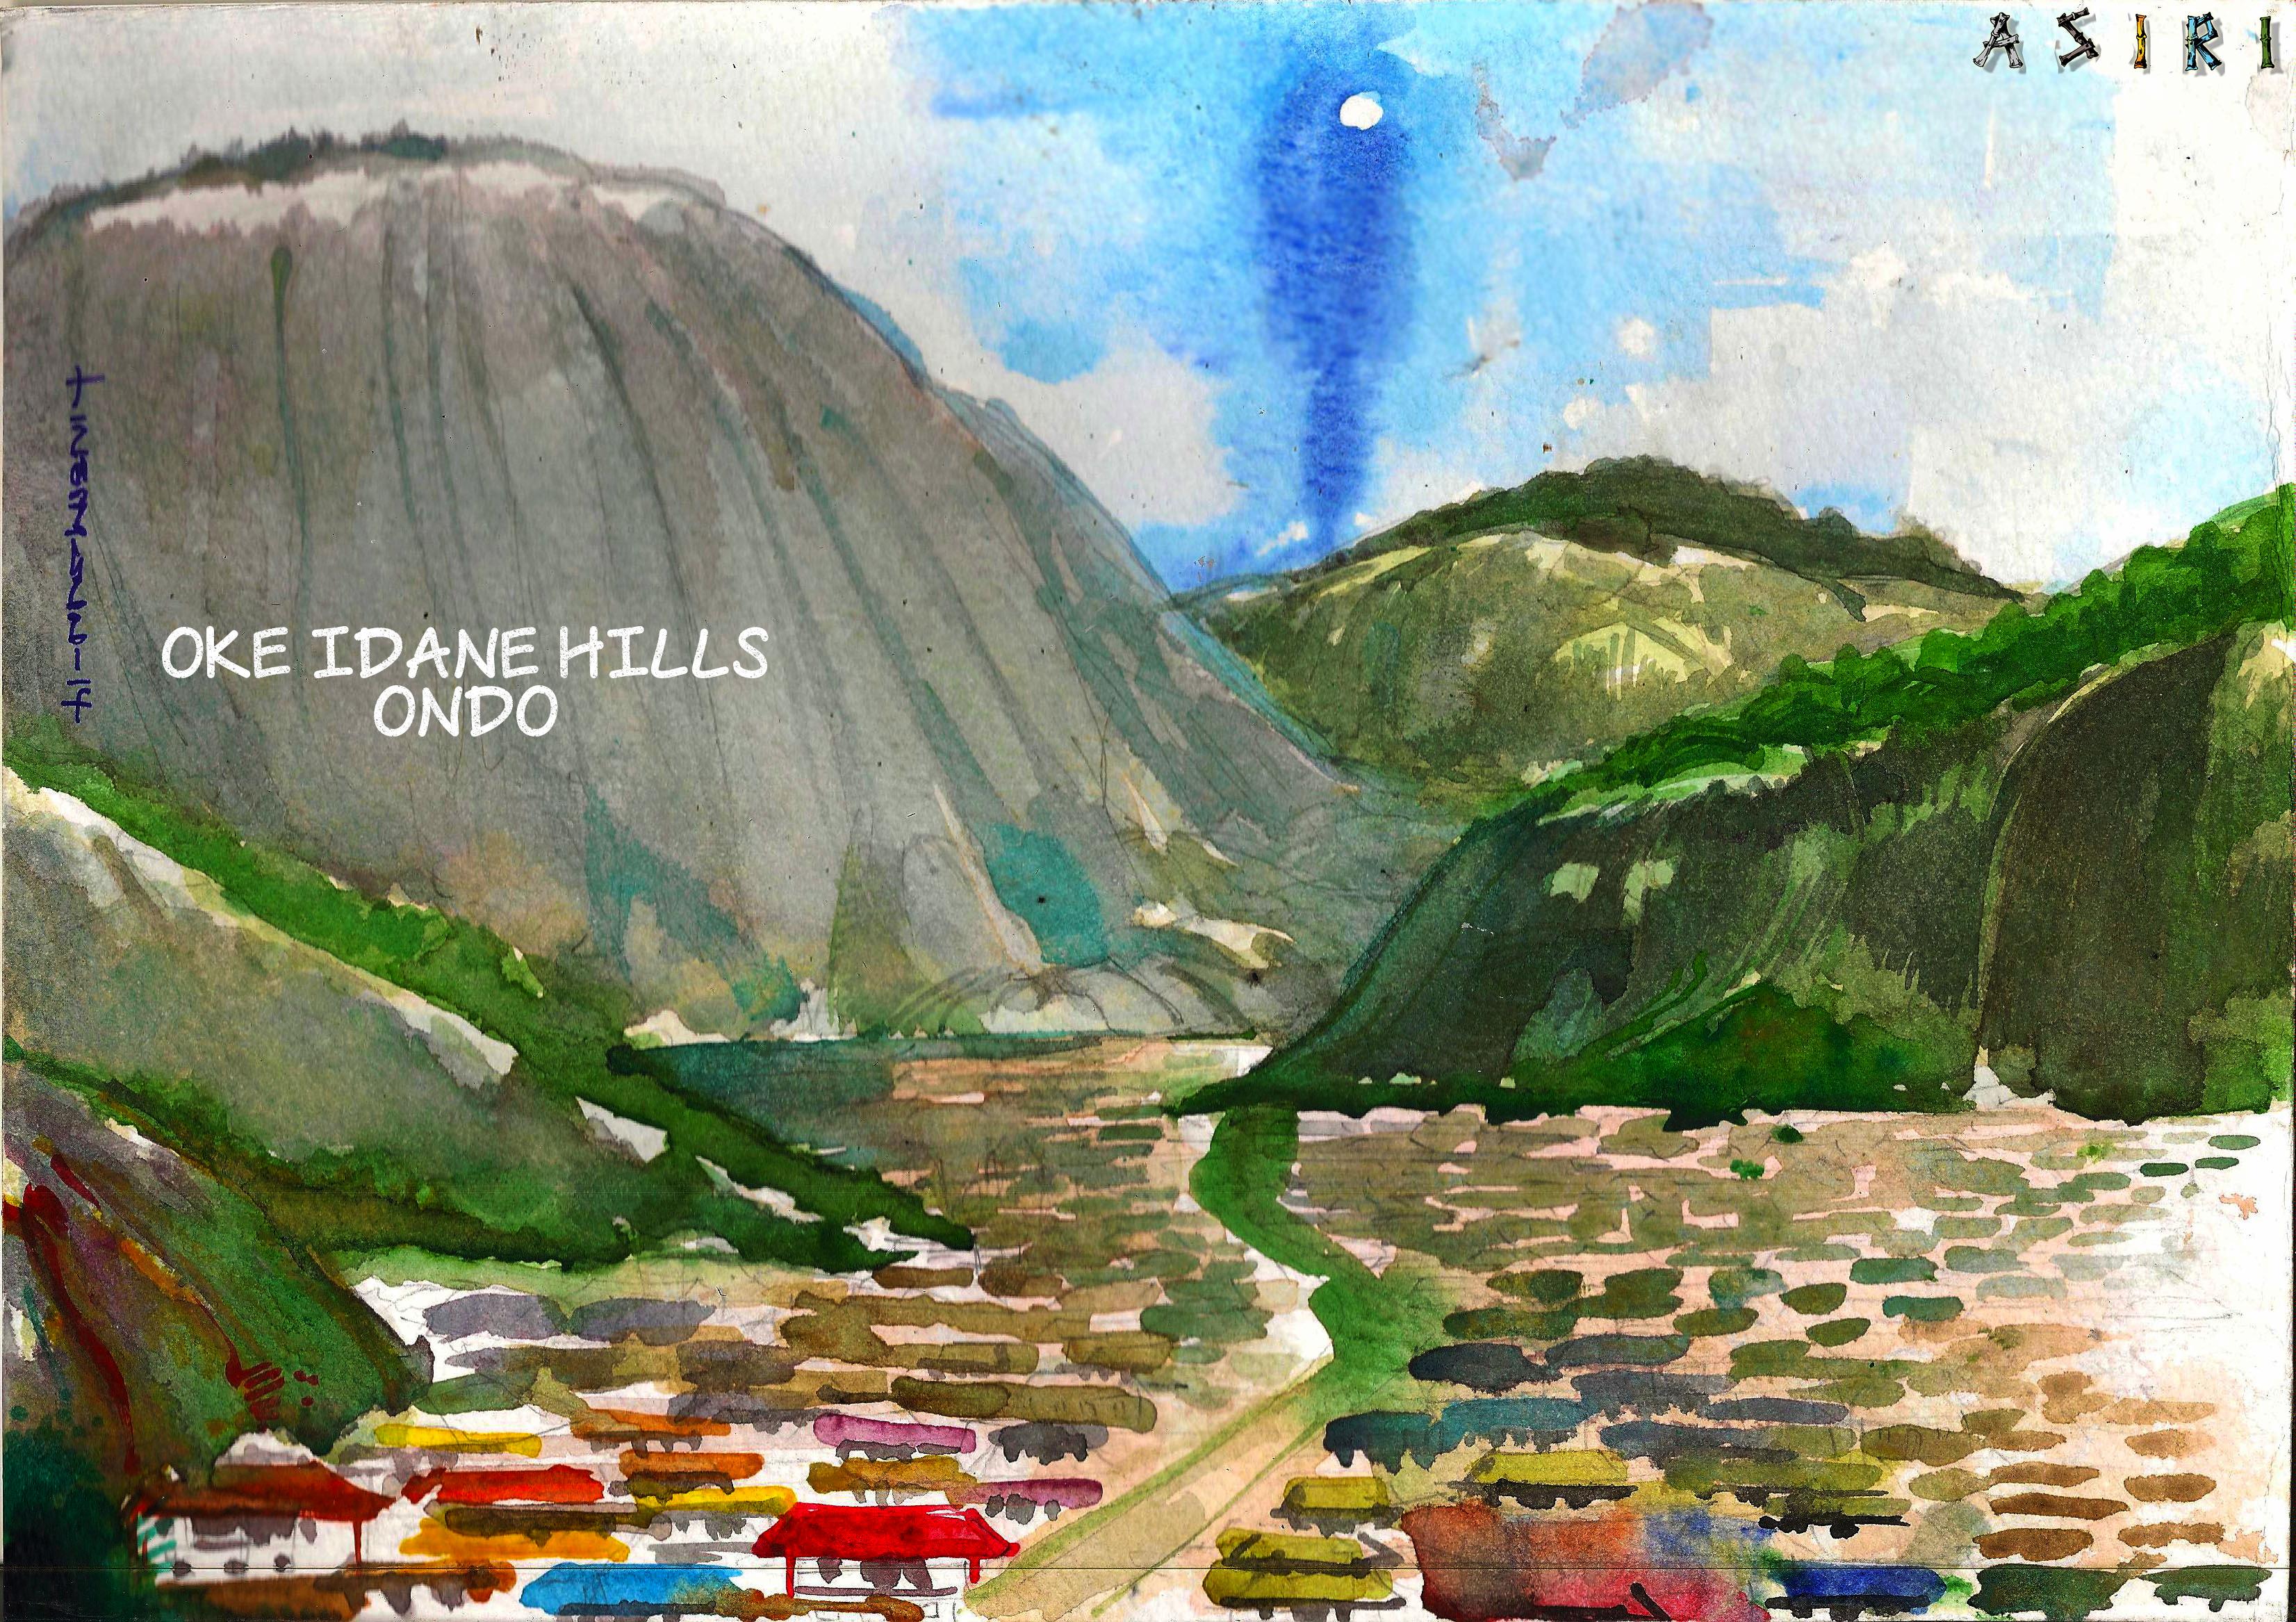 Oke idanre hills Ondo